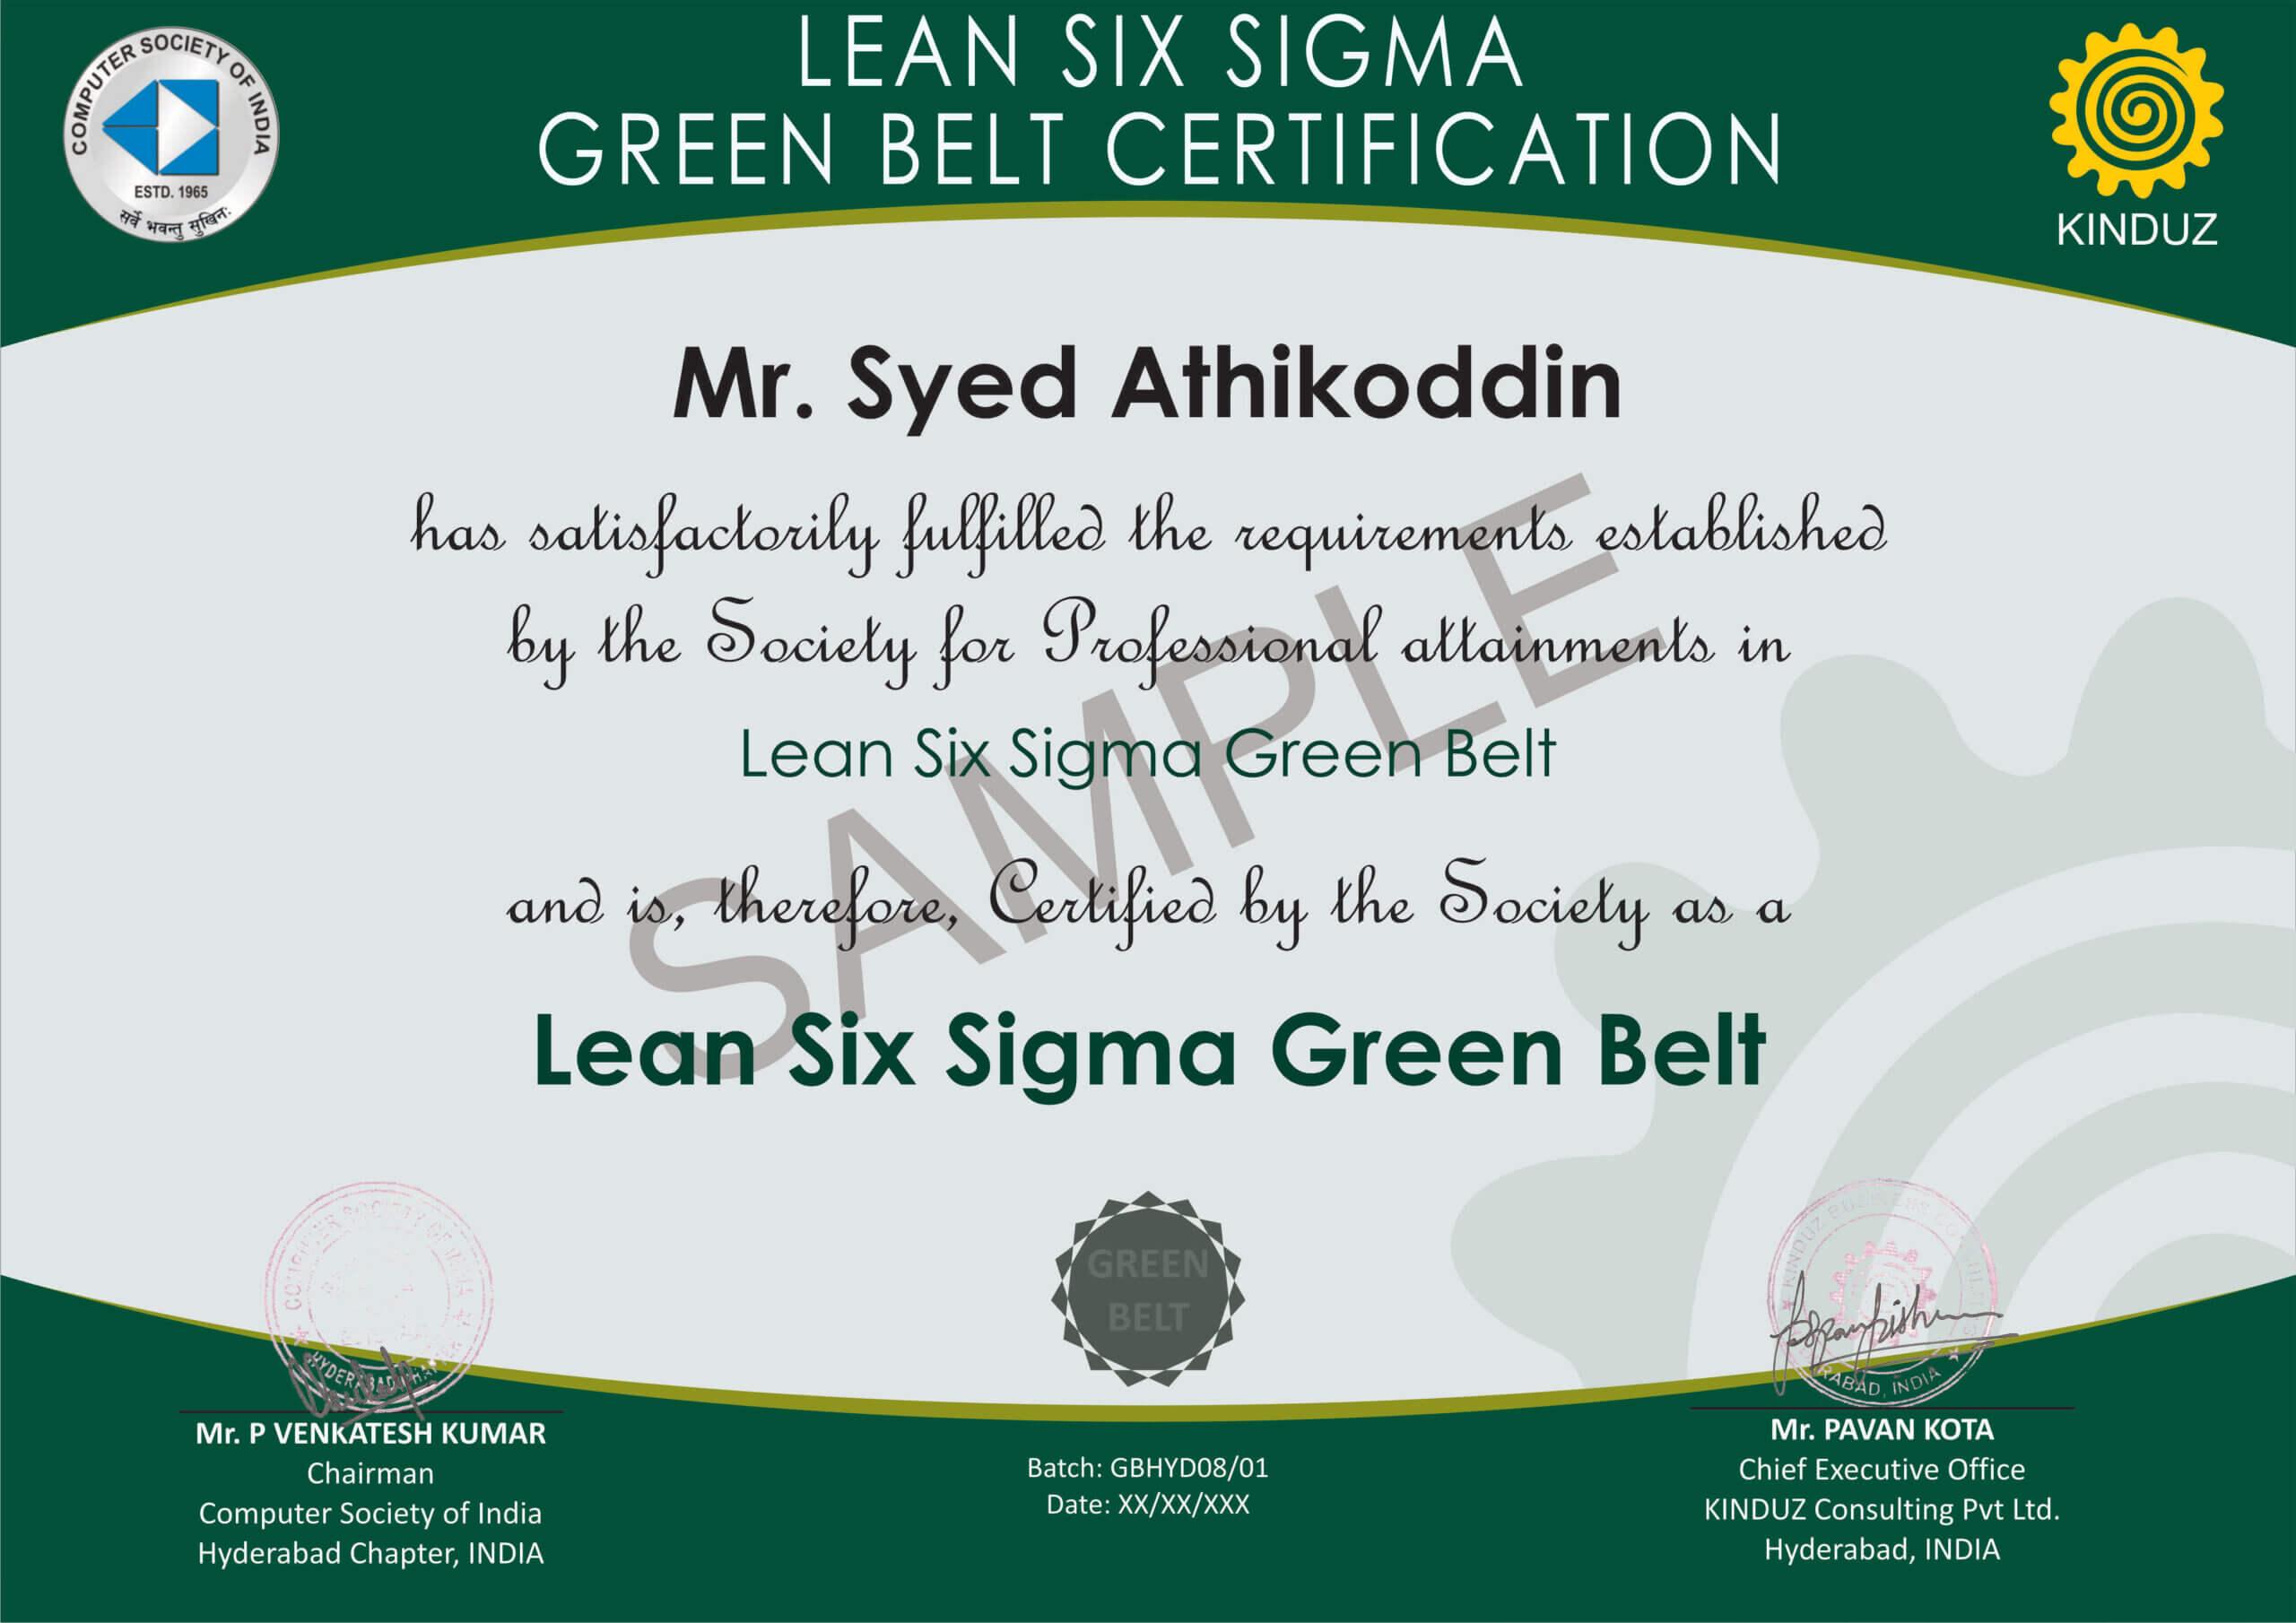 Sample Certificates - Lean Six Sigma India Throughout Green Belt Certificate Template